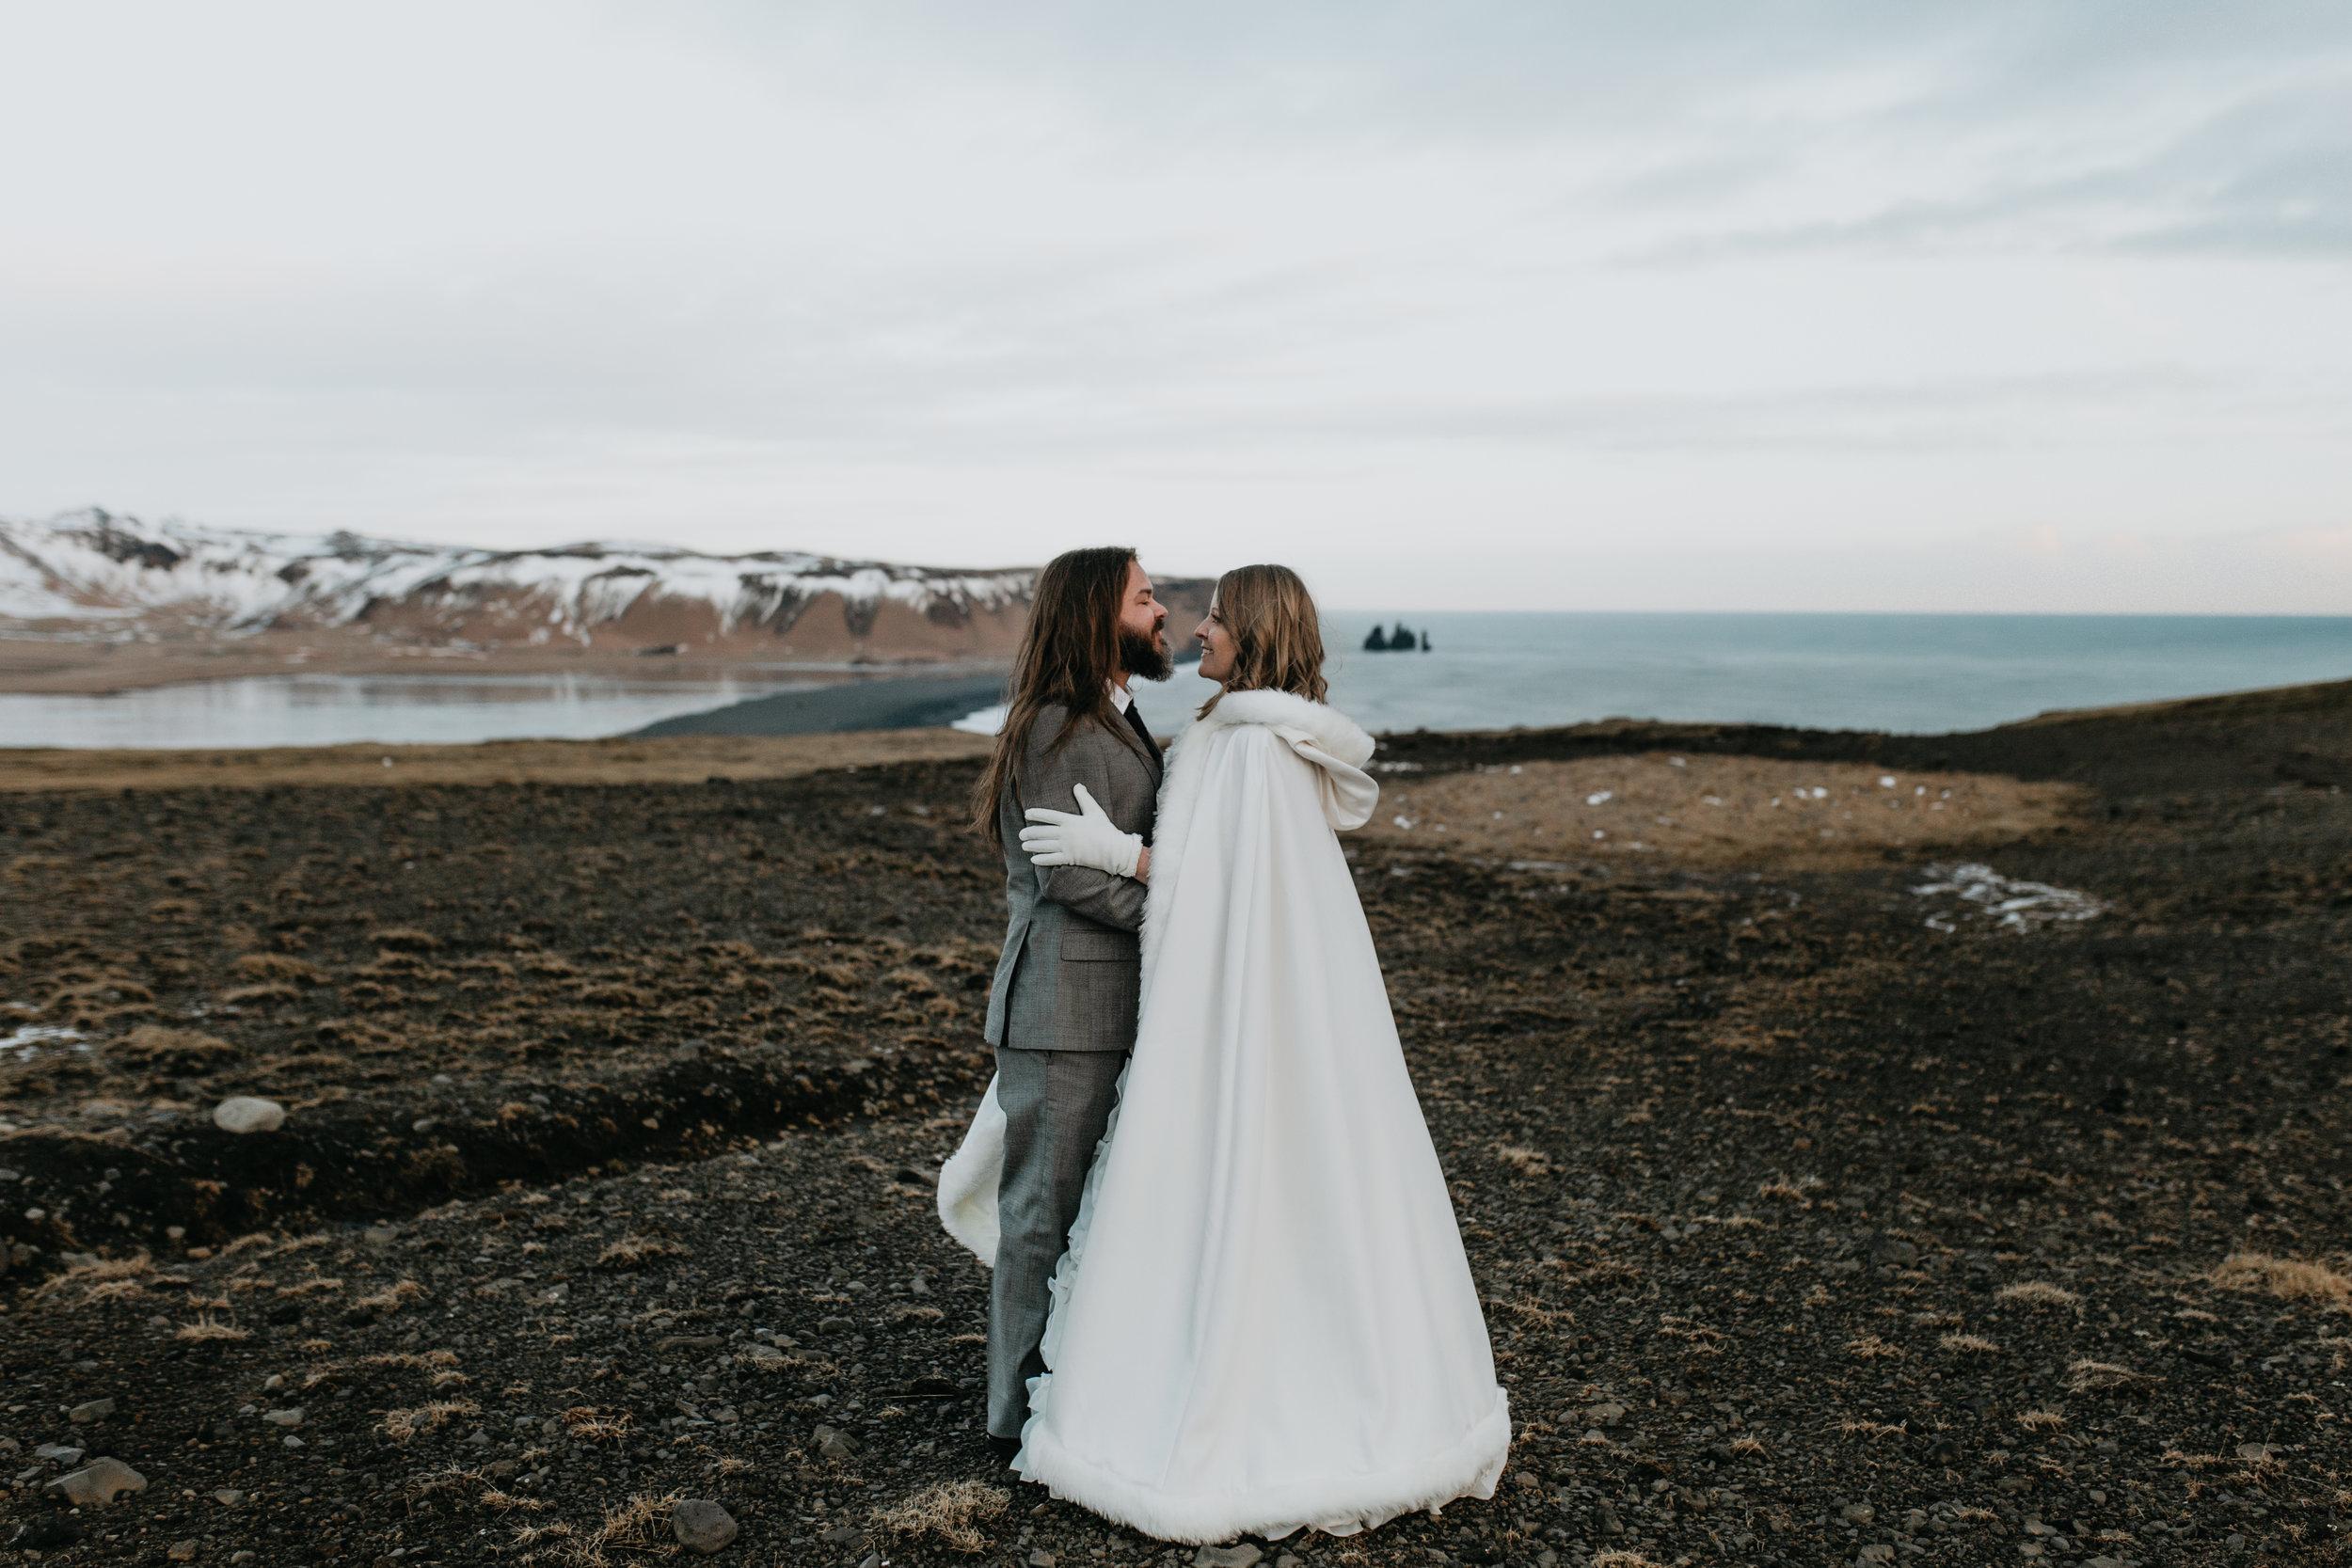 nicole-daacke-photography-iceland-winter-sunset-adventure-elopement-skogafoss-waterfall-black-sand-beach-dyrholaey-vik-iceland-intimate-wedding-black-church-elopement-photographer-34.jpg